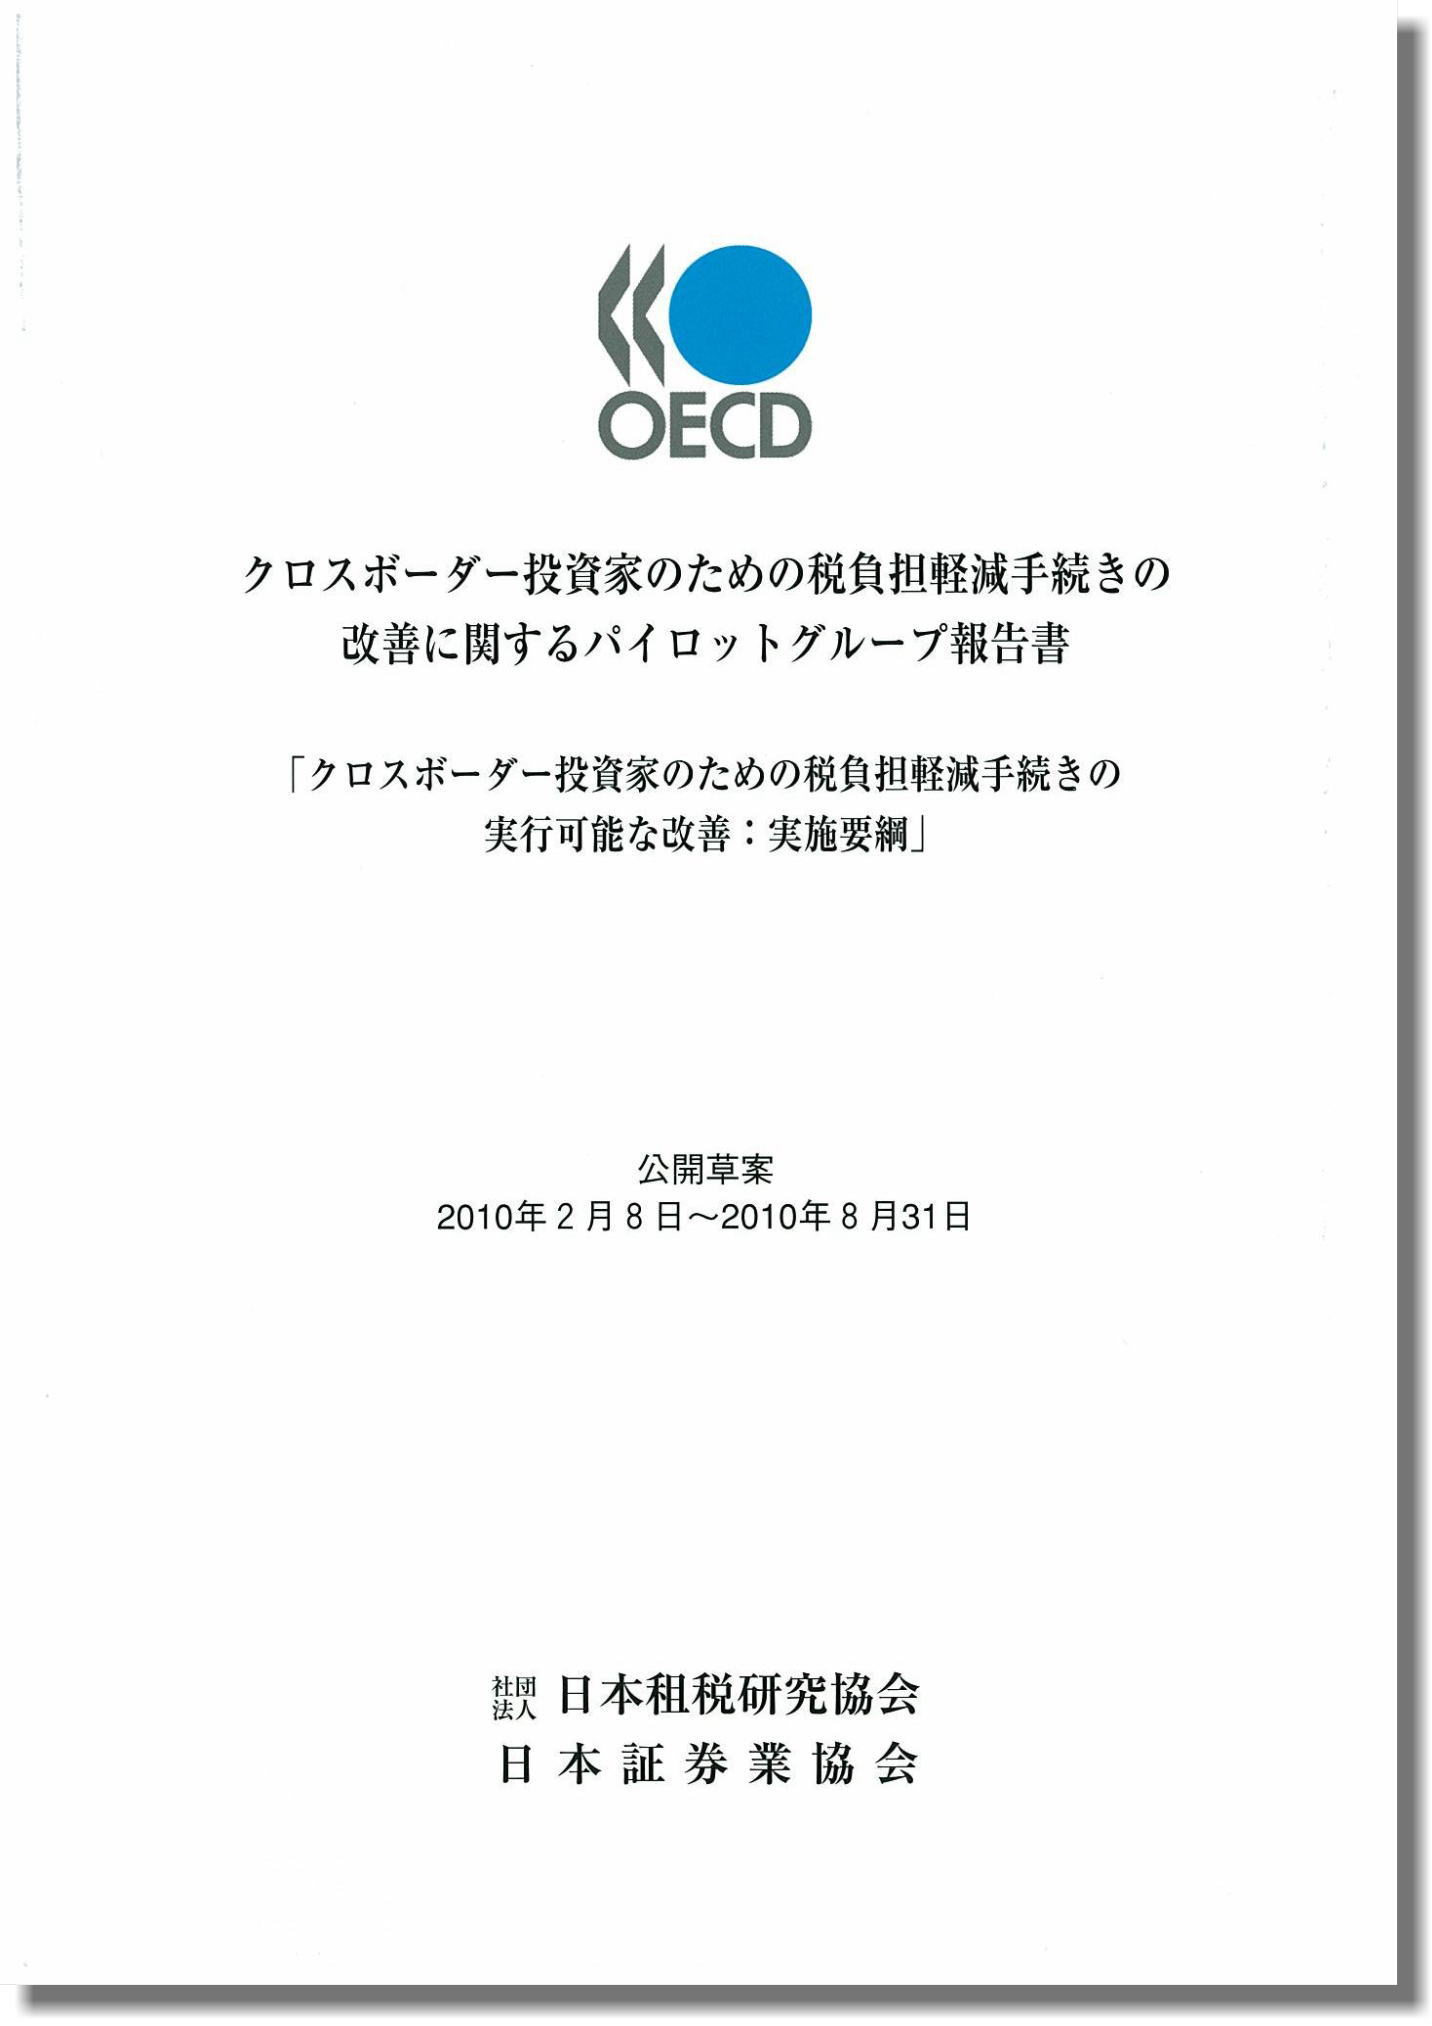 ECD クロスボーダー投資家のための税負担軽減手続きの改善に関するパイロットグループ報告書  「クロスボーダー投資家のための税負担軽減手続きの実行可能な改善:実施要綱」  公開草案 2010年2月8日~2010年8月31日